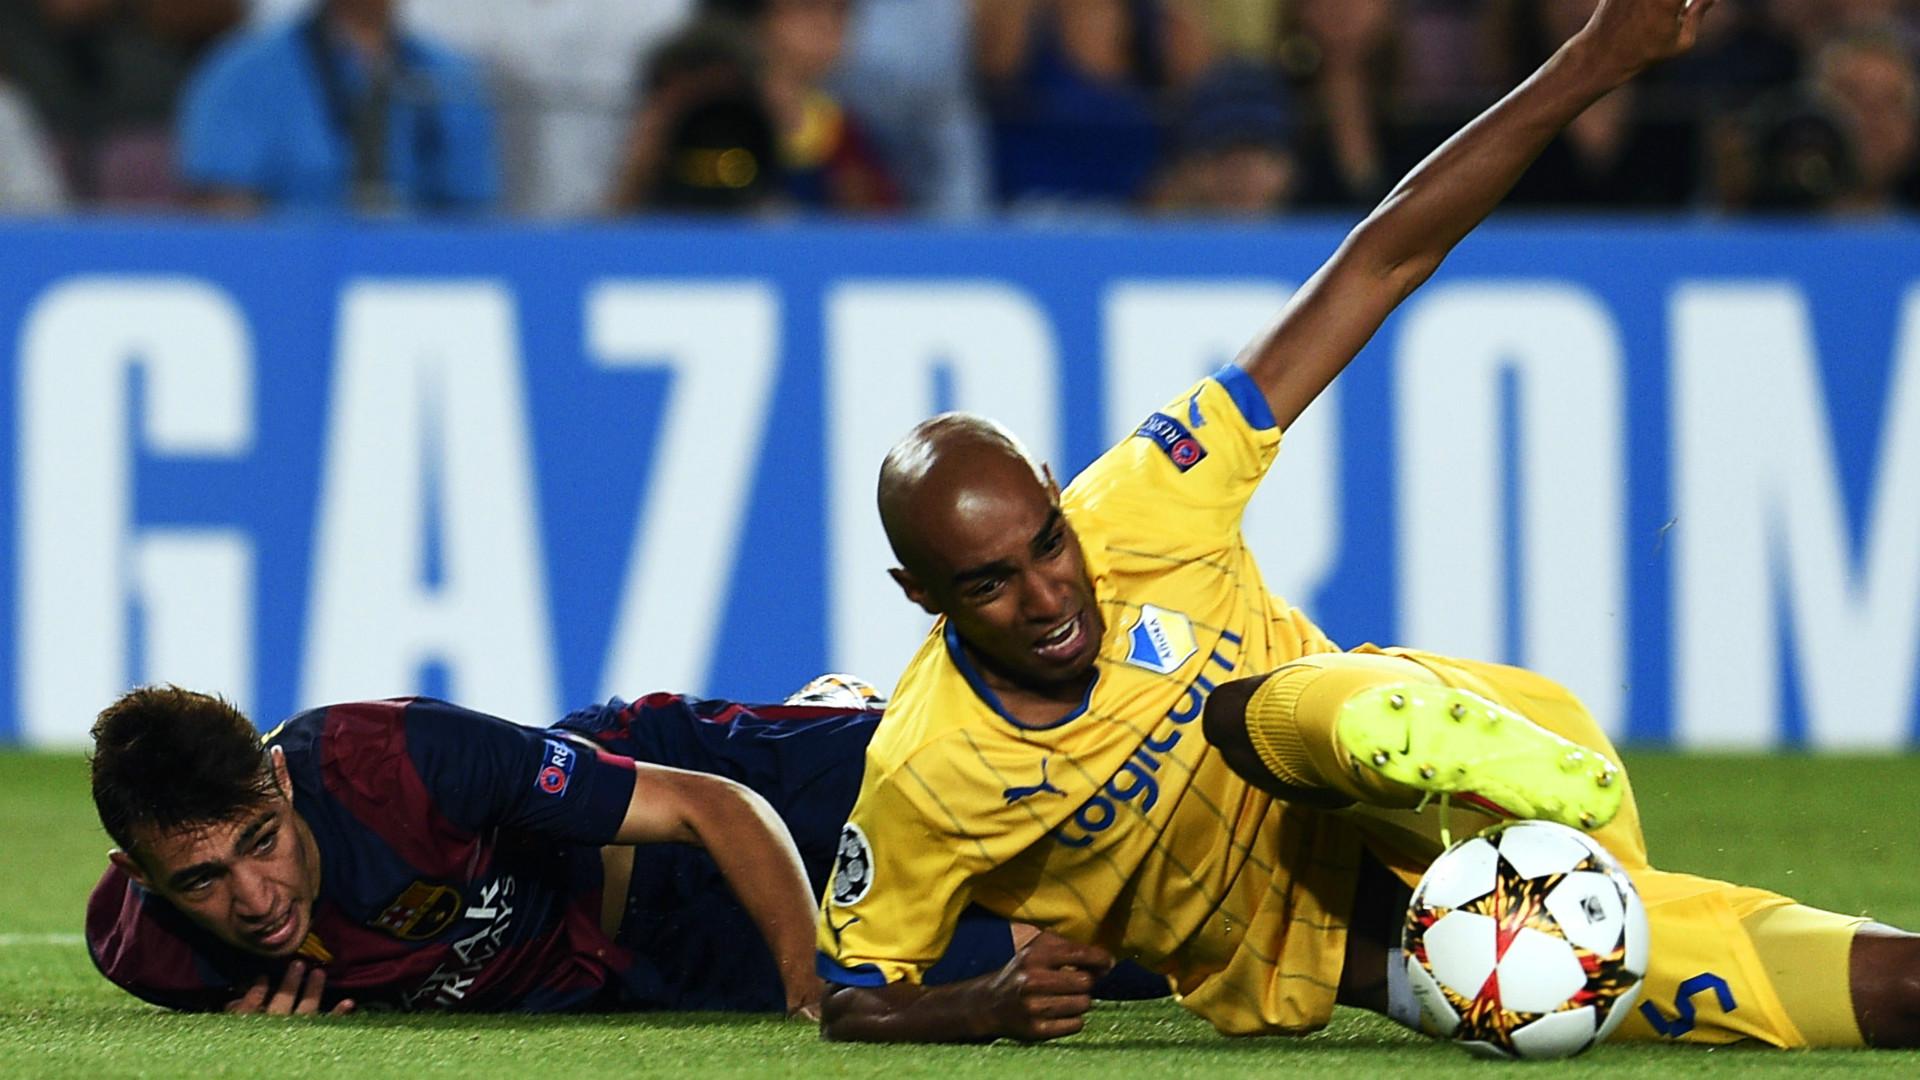 Munir Barcelona Carlao APOEL UEFA Champions League